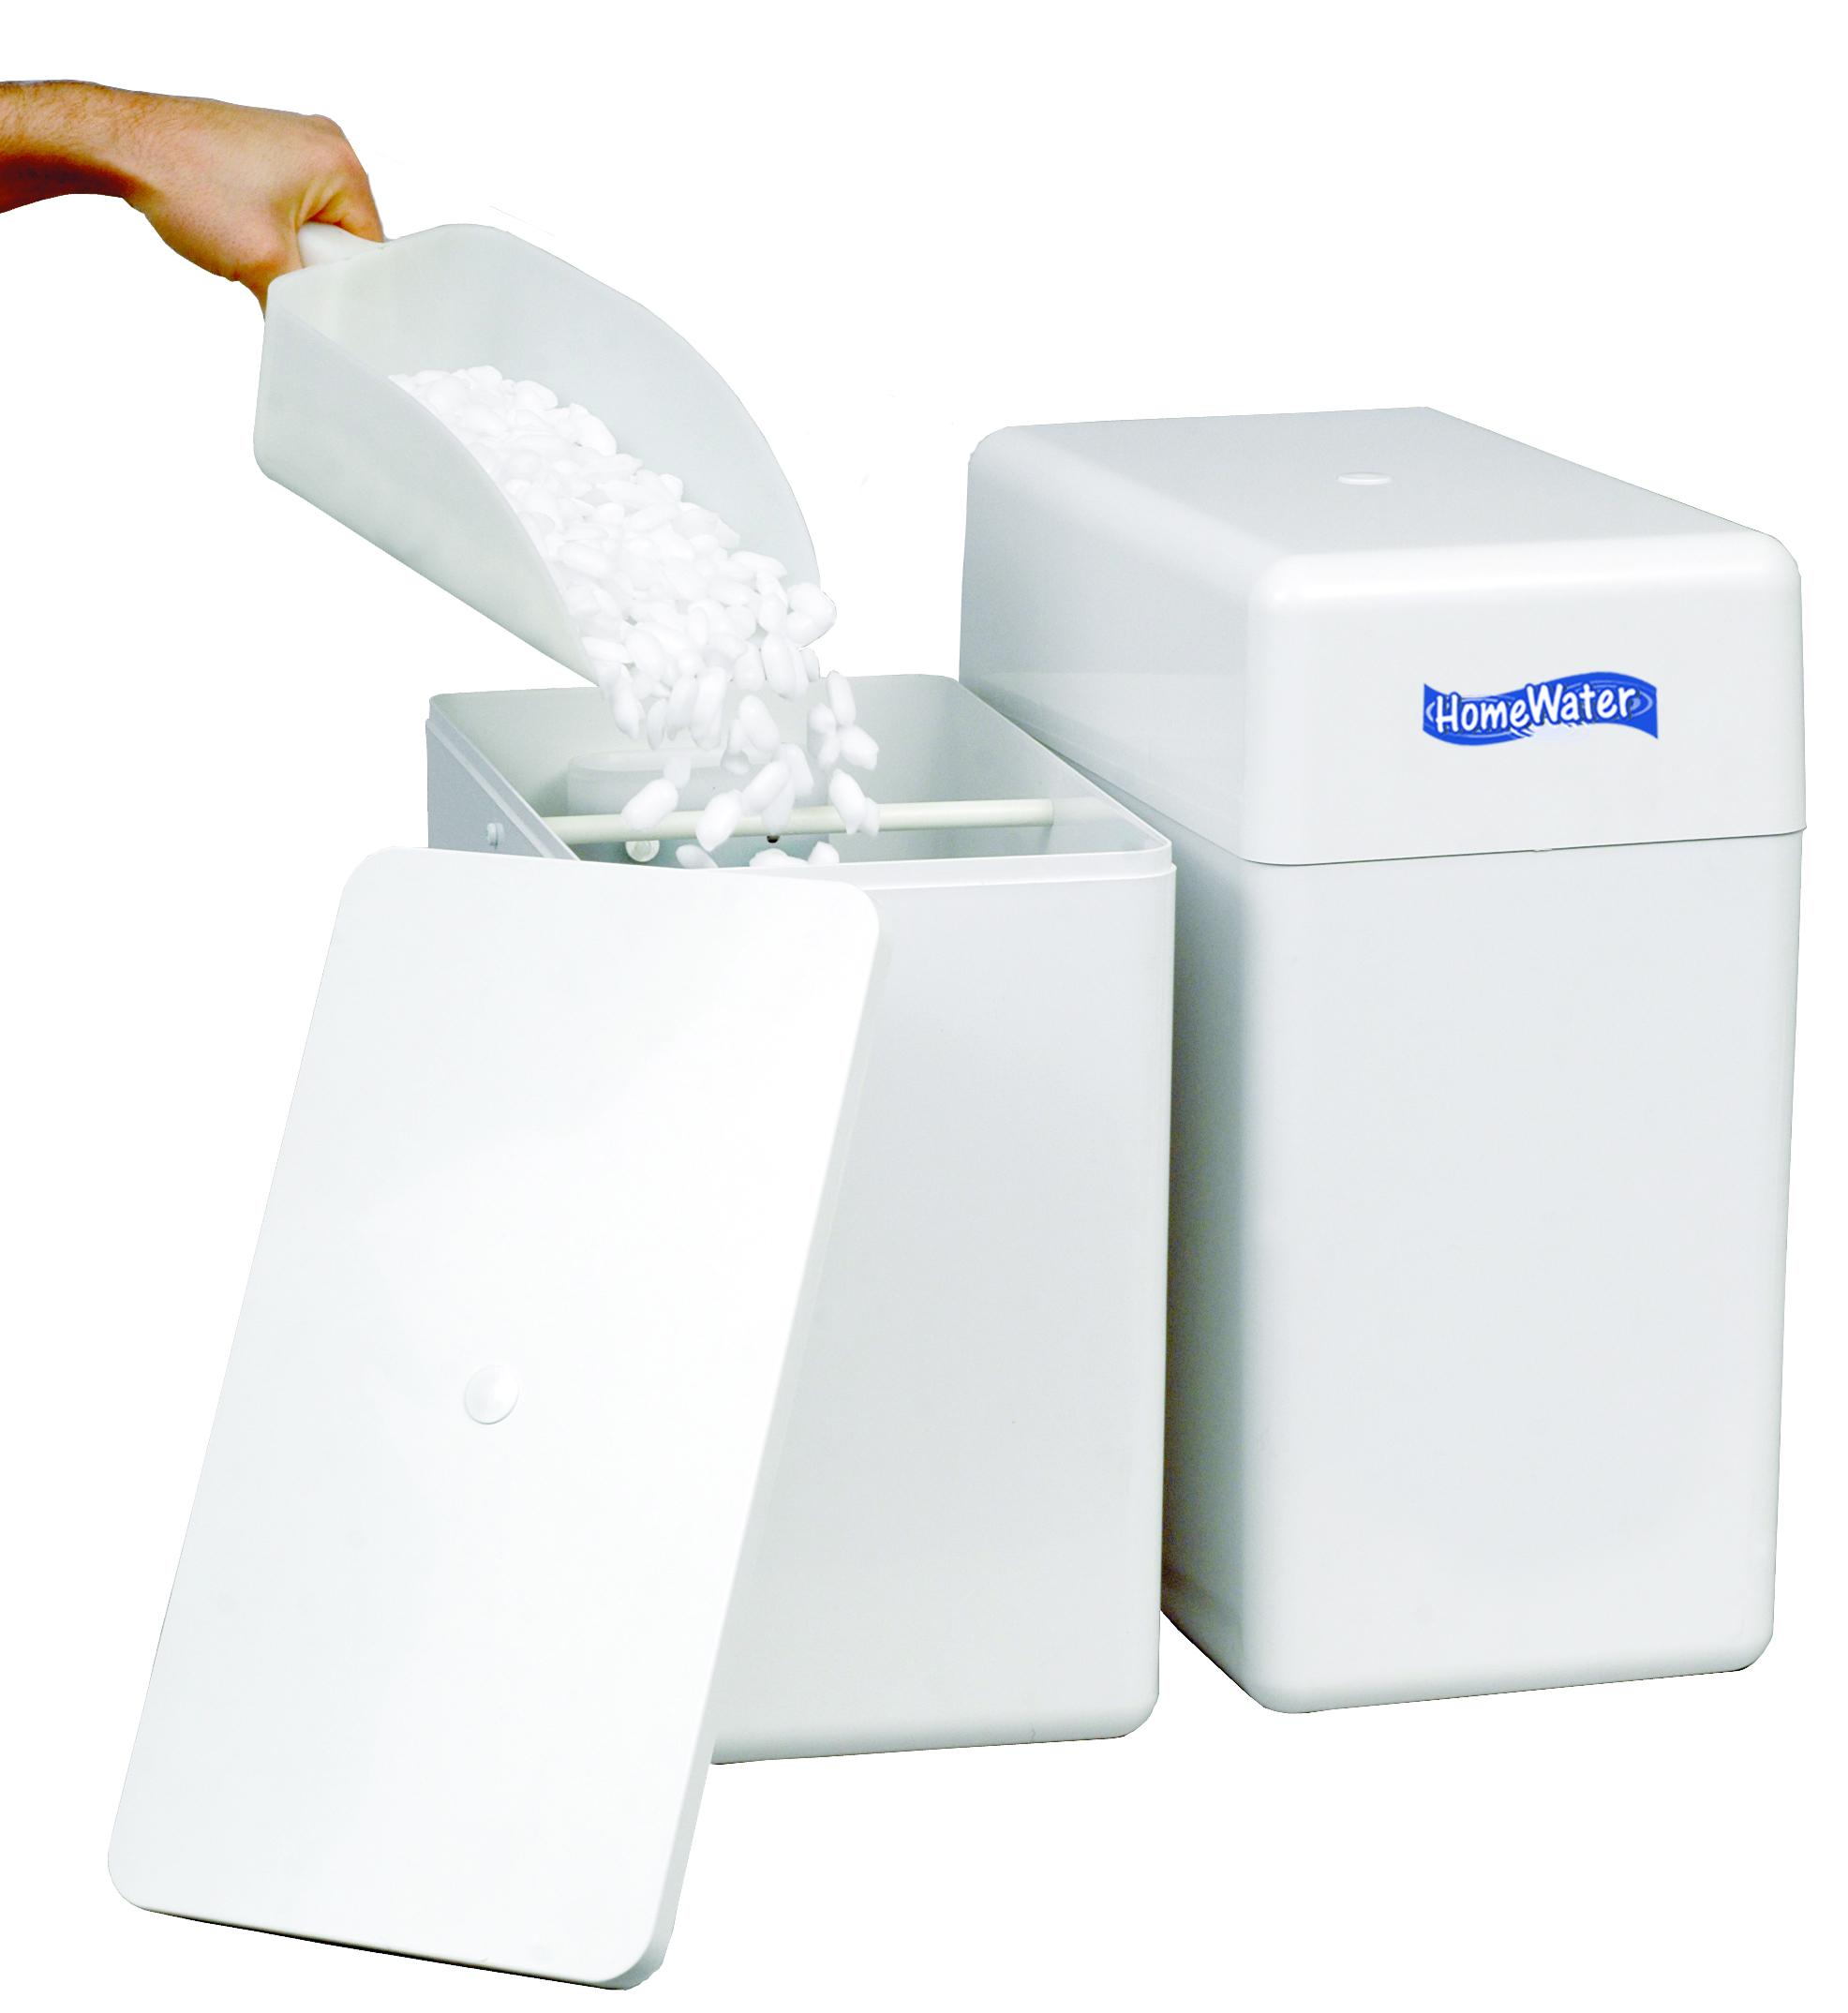 500 Homewater